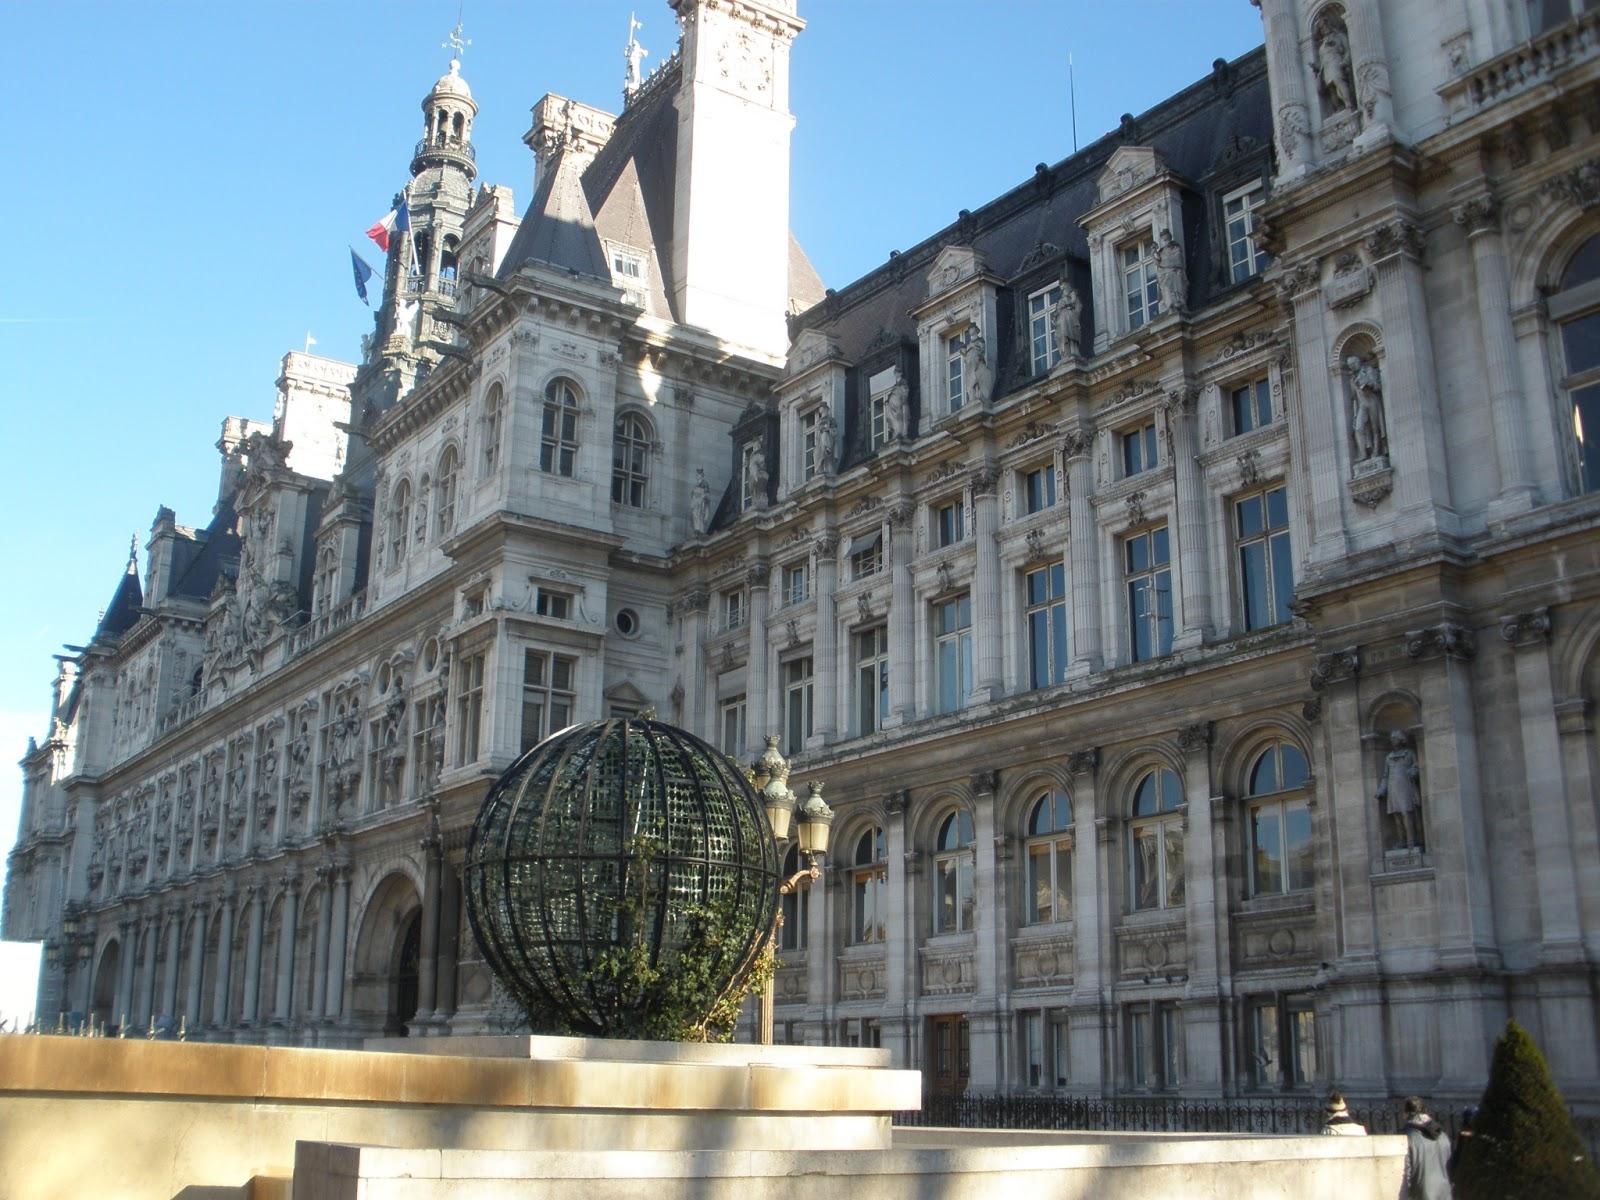 Ilovetravels Happy New Year From Paris Hotel De Ville